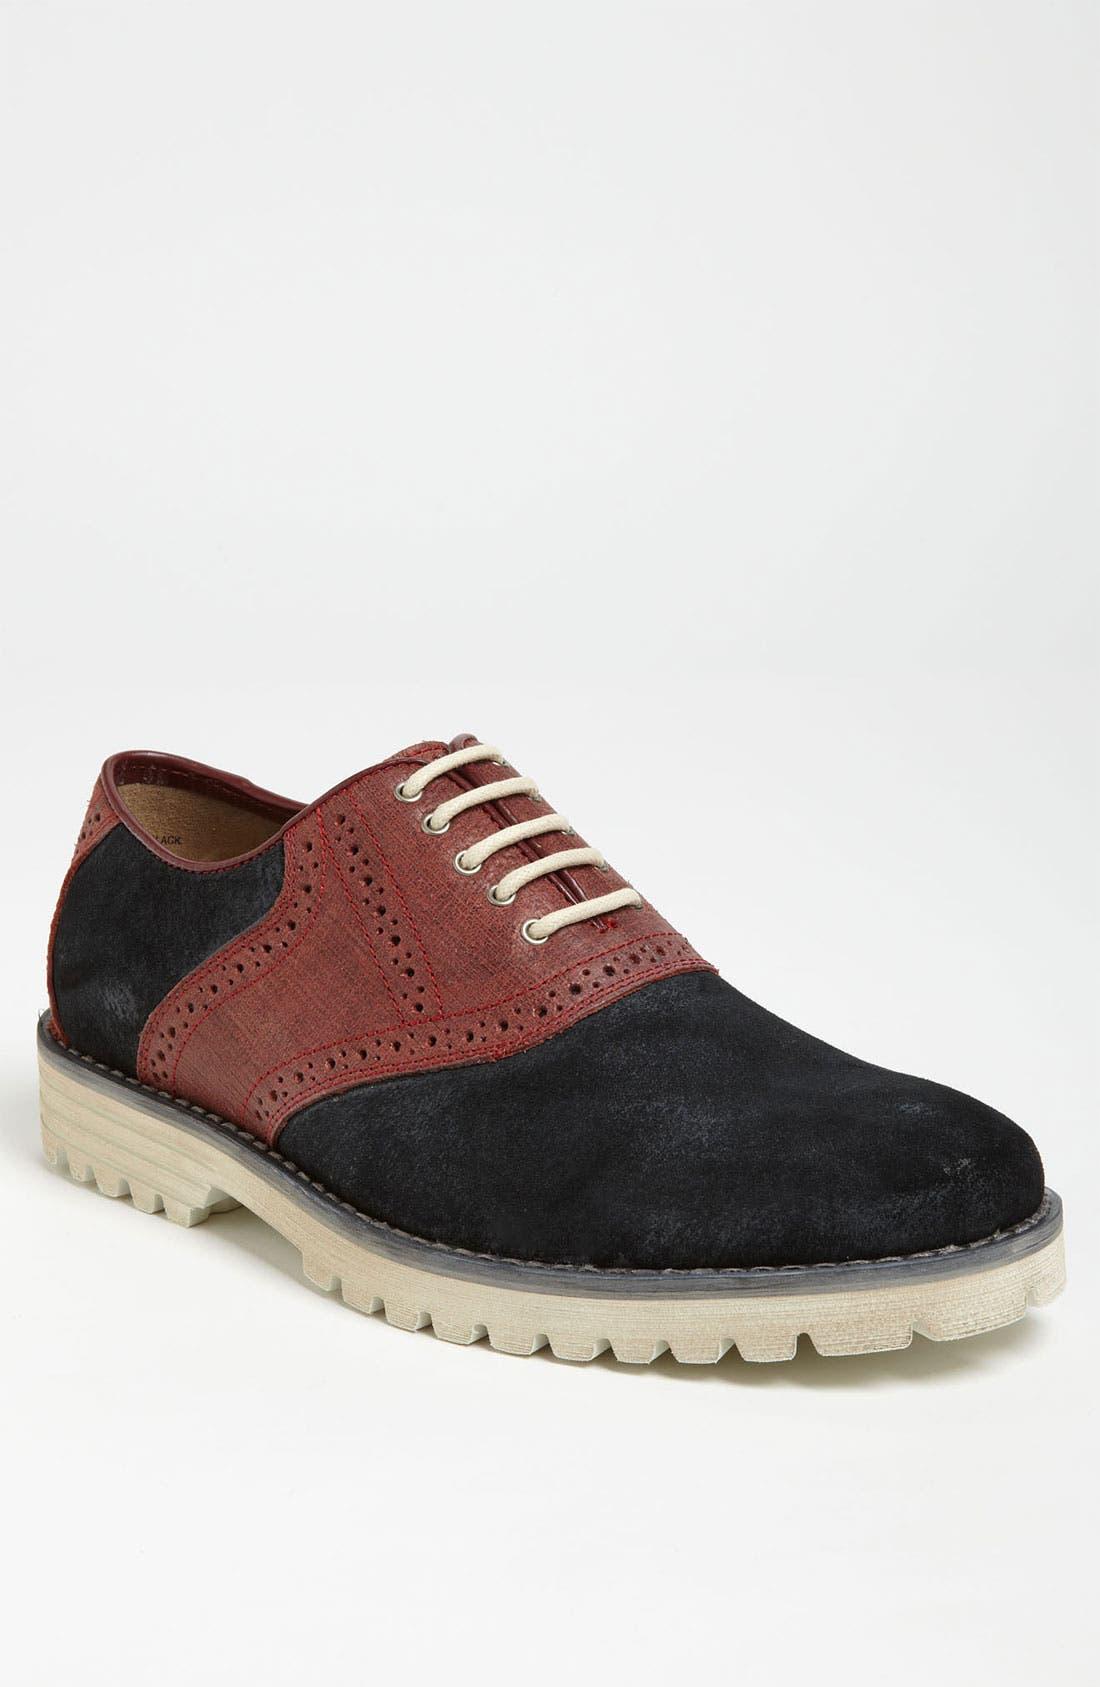 Alternate Image 1 Selected - Hush Puppies® 'Authentic' Saddle Shoe